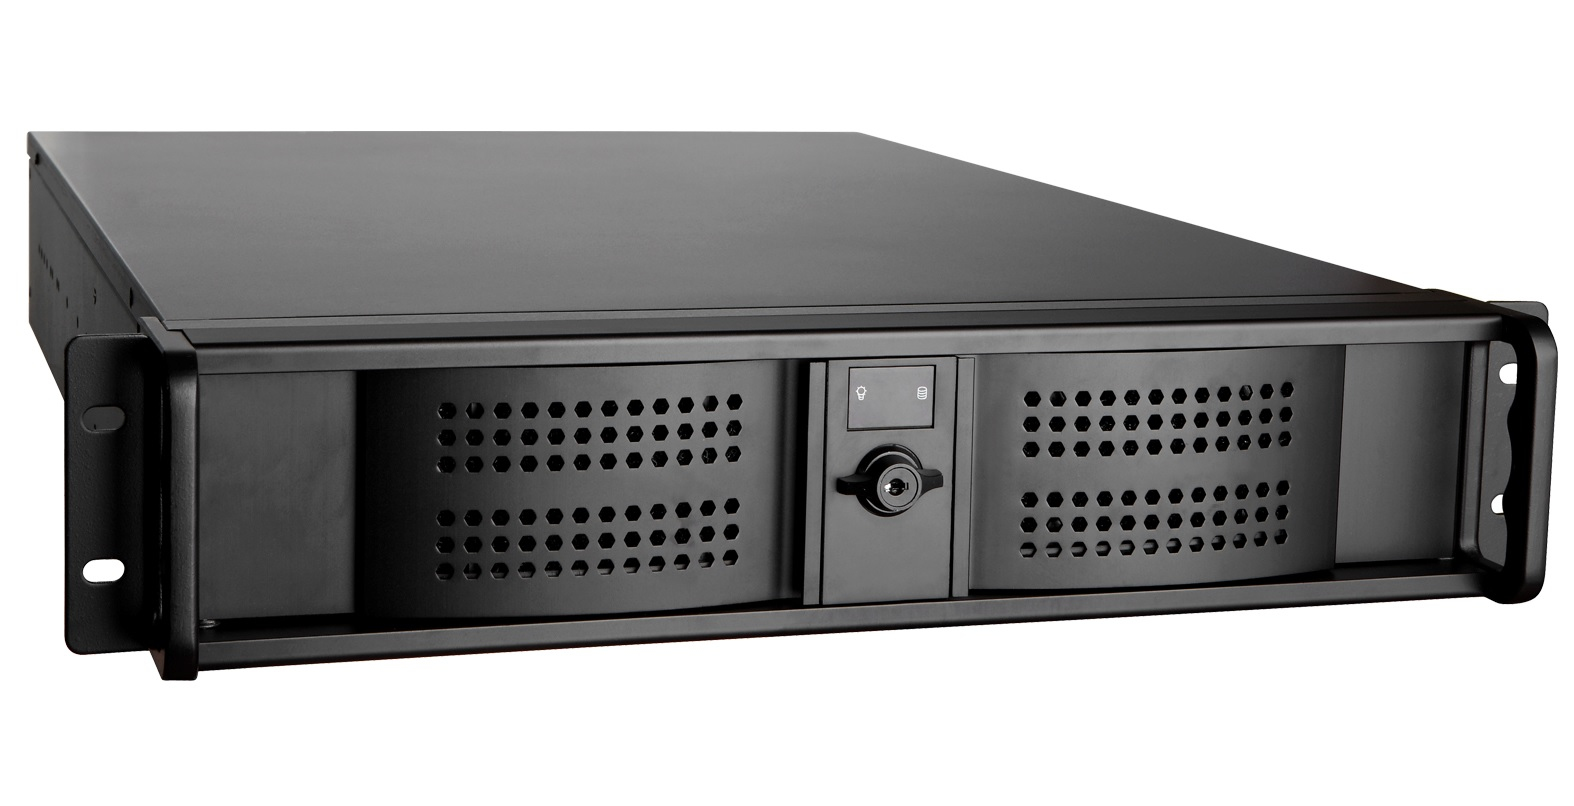 Ultron RPS19-2535 - Rack - Server - Aluminium - Metall - Schwarz - ATX - 2U